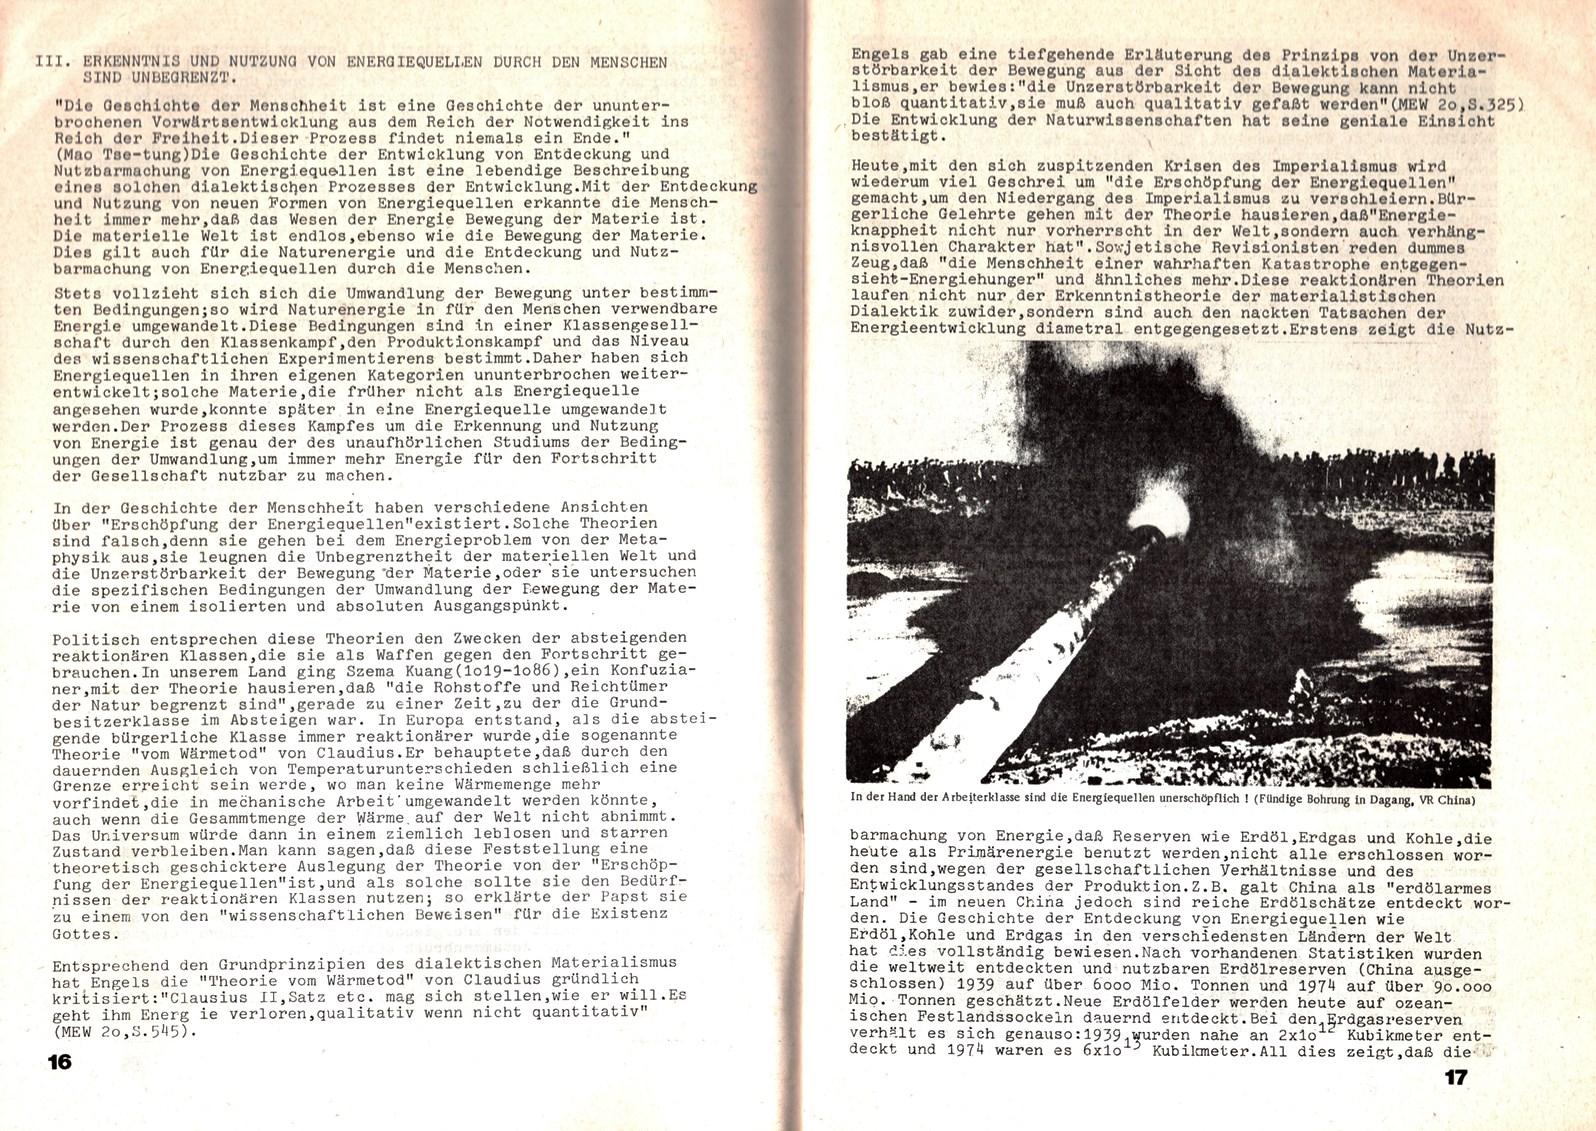 KSV_1976_Atomenergie_im_Kapitalismus_010